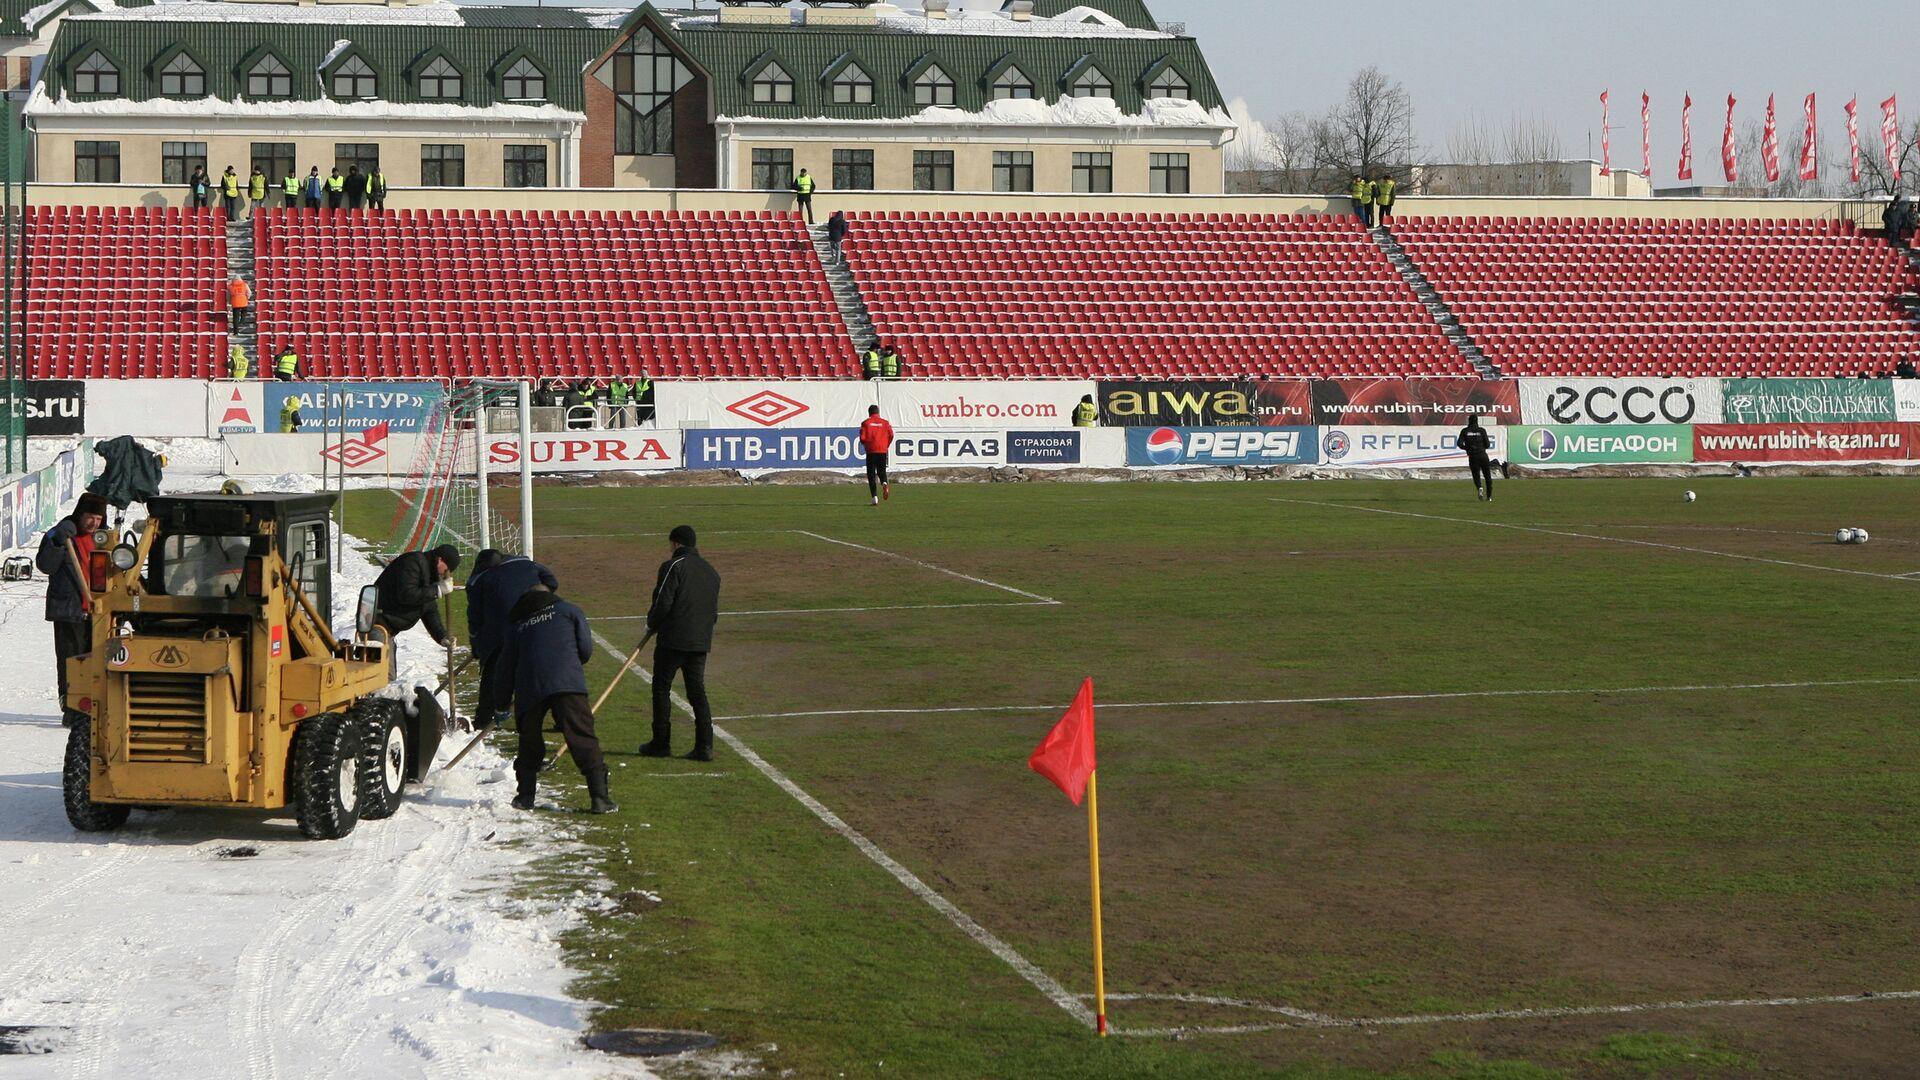 Резервное поле Рубина - РИА Новости, 1920, 22.02.2021